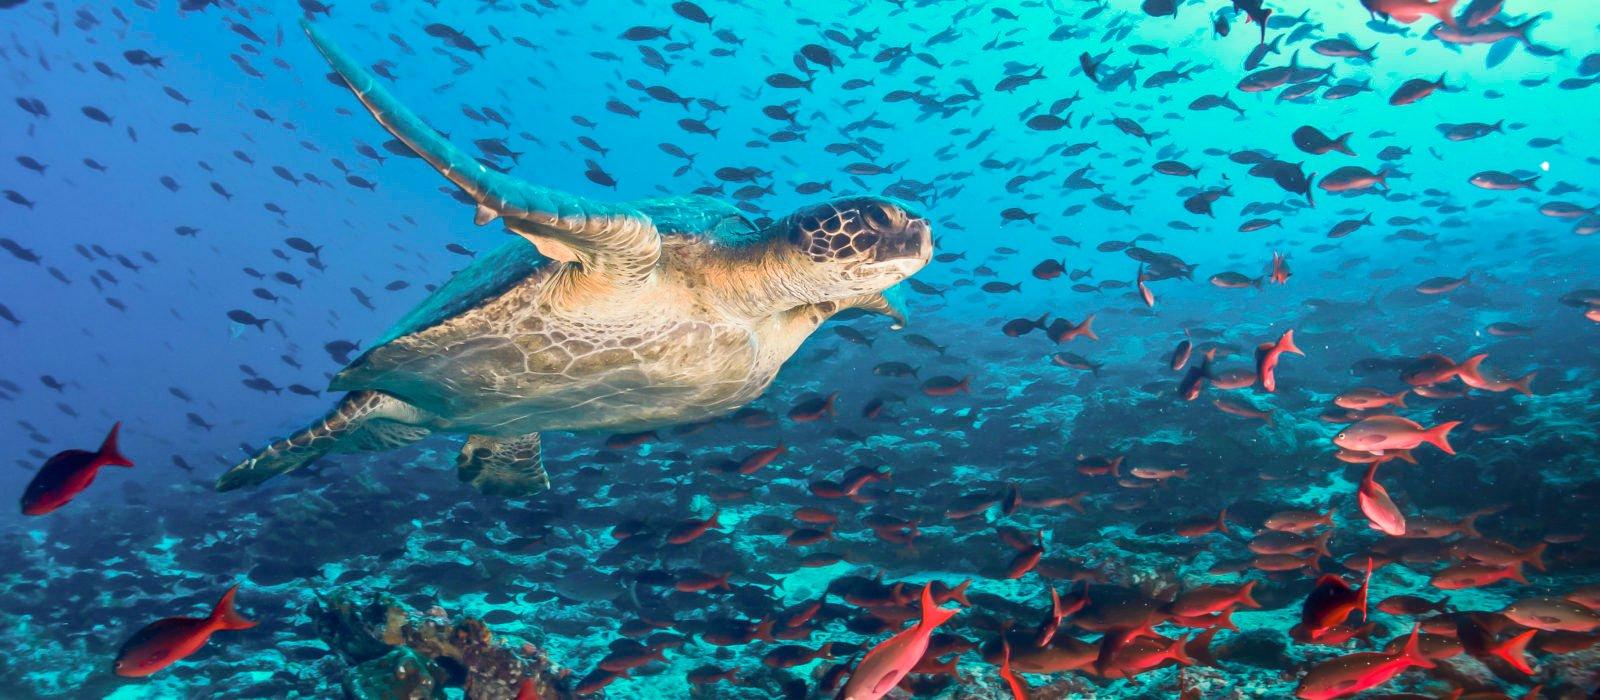 turtle-fish-underwater-galapagos-islands